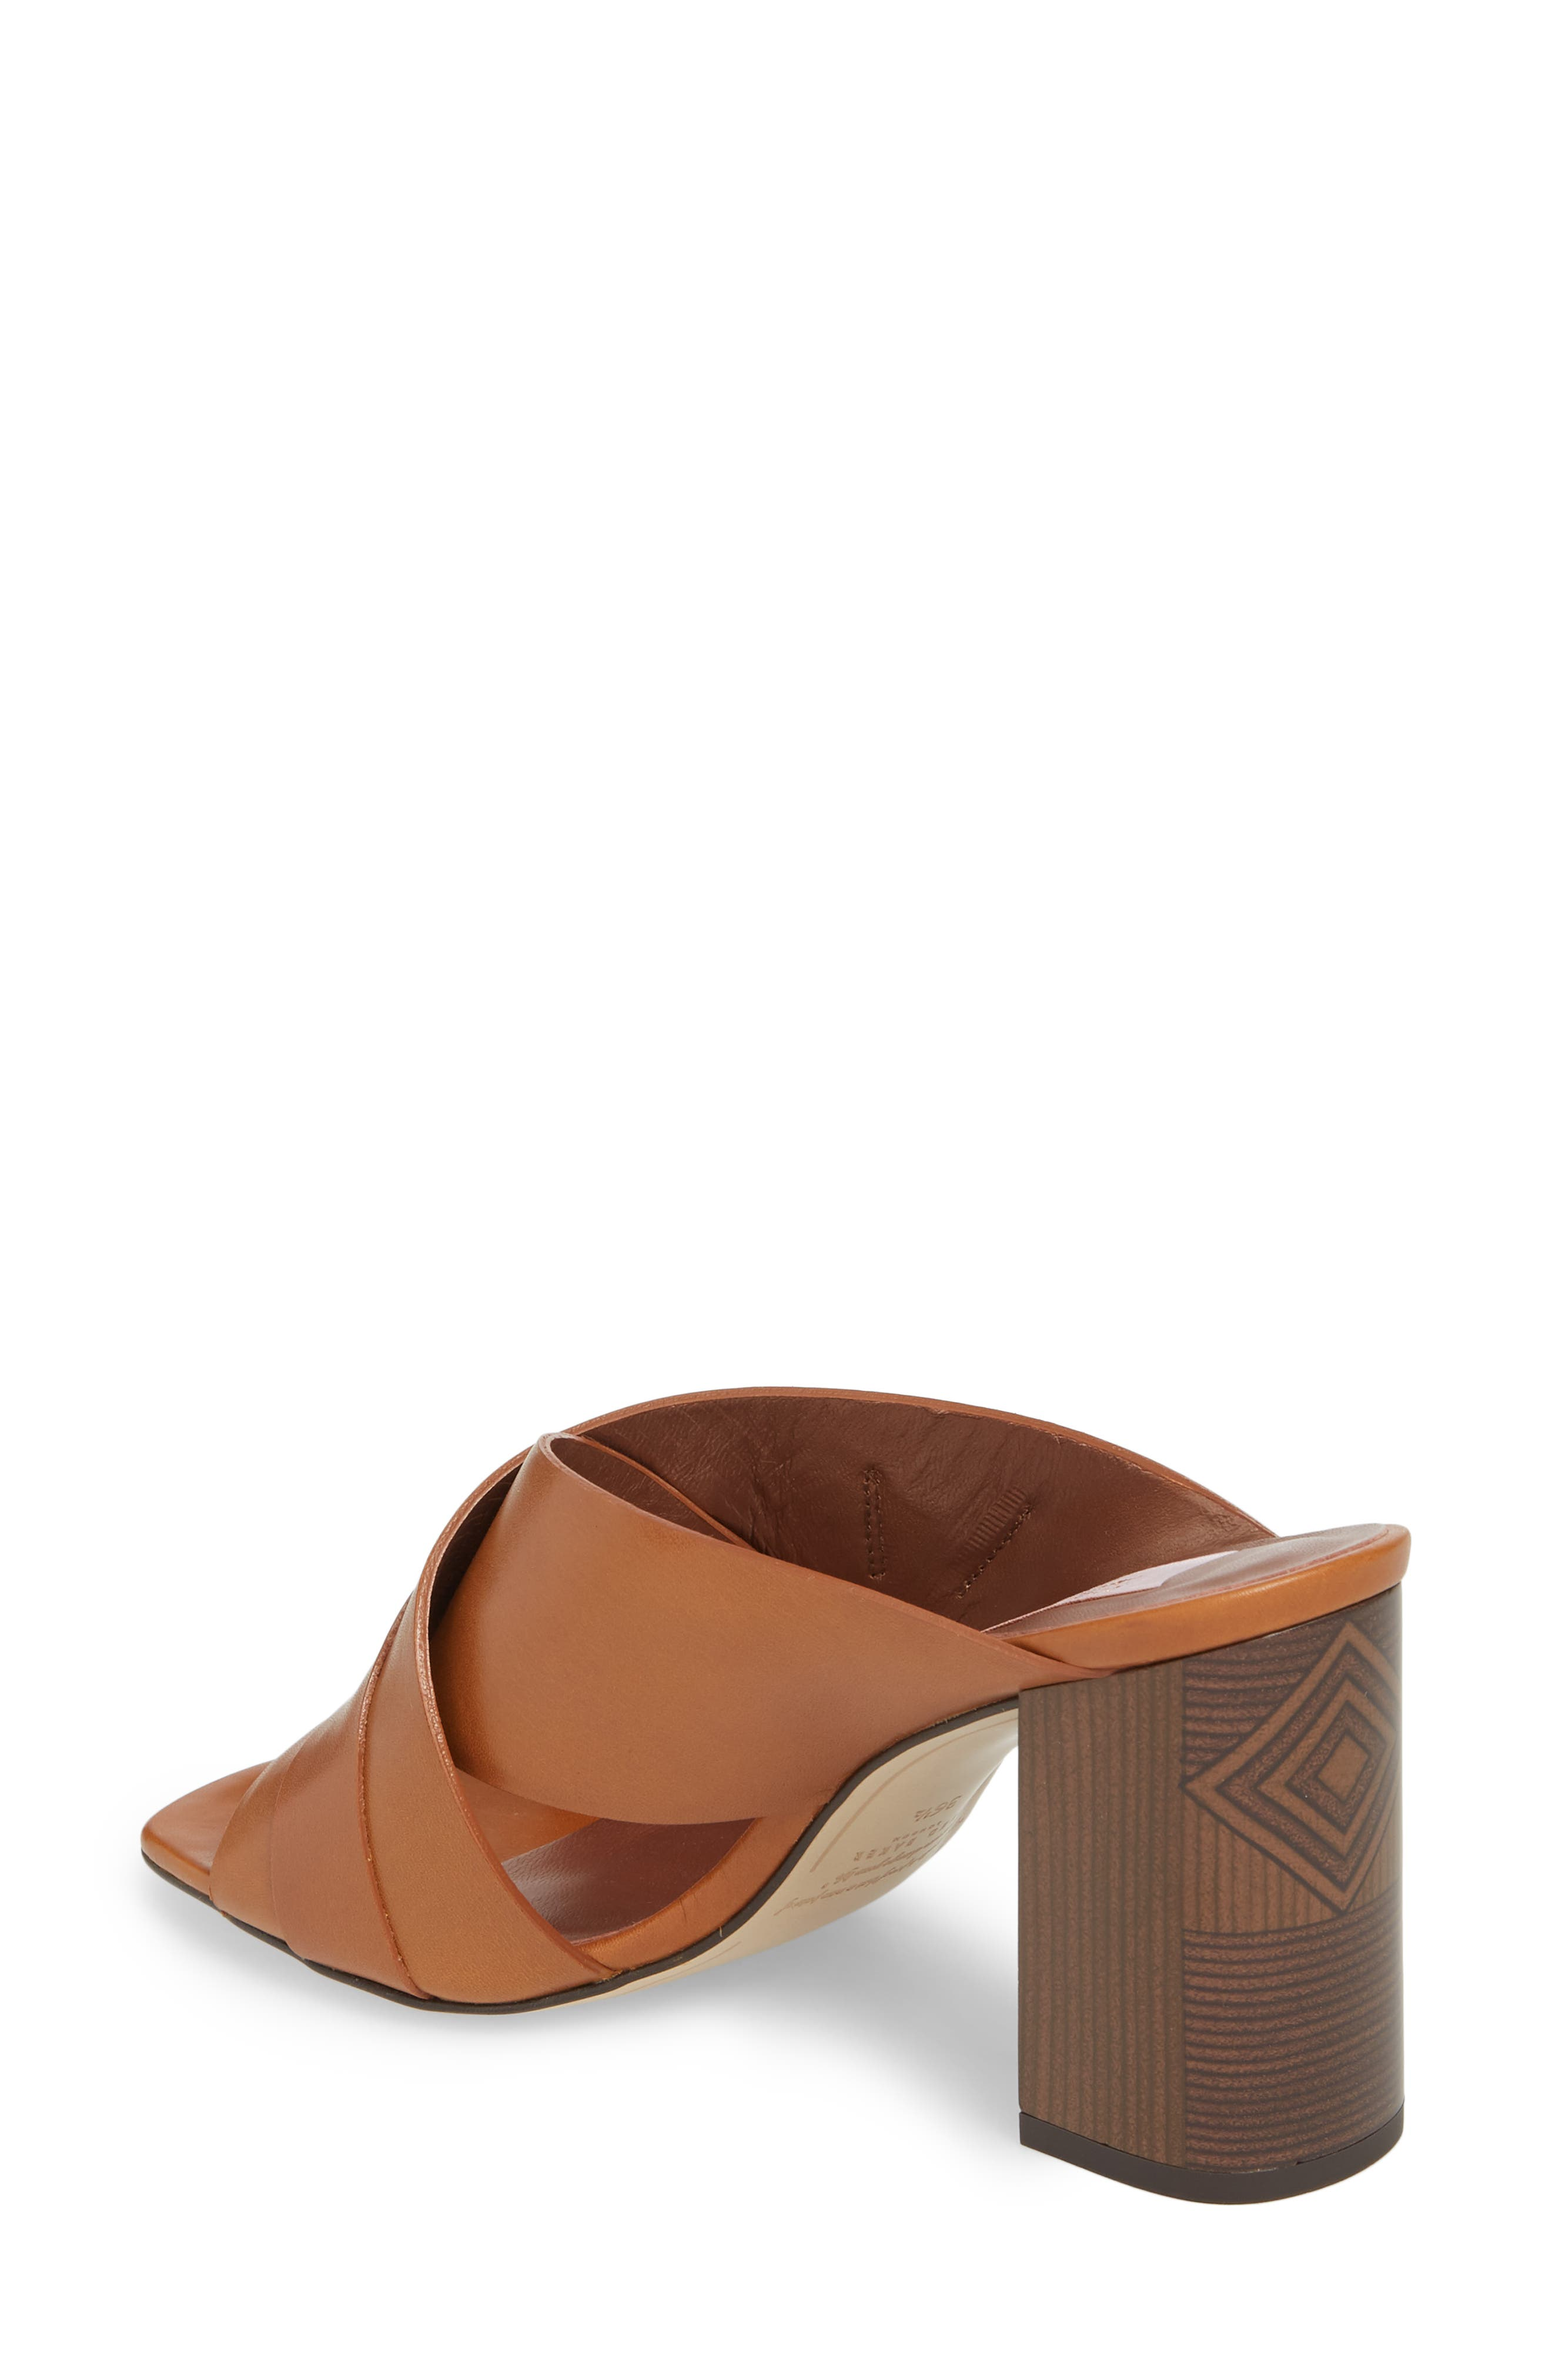 Maladas Slide Sandal,                             Alternate thumbnail 2, color,                             Tan Leather